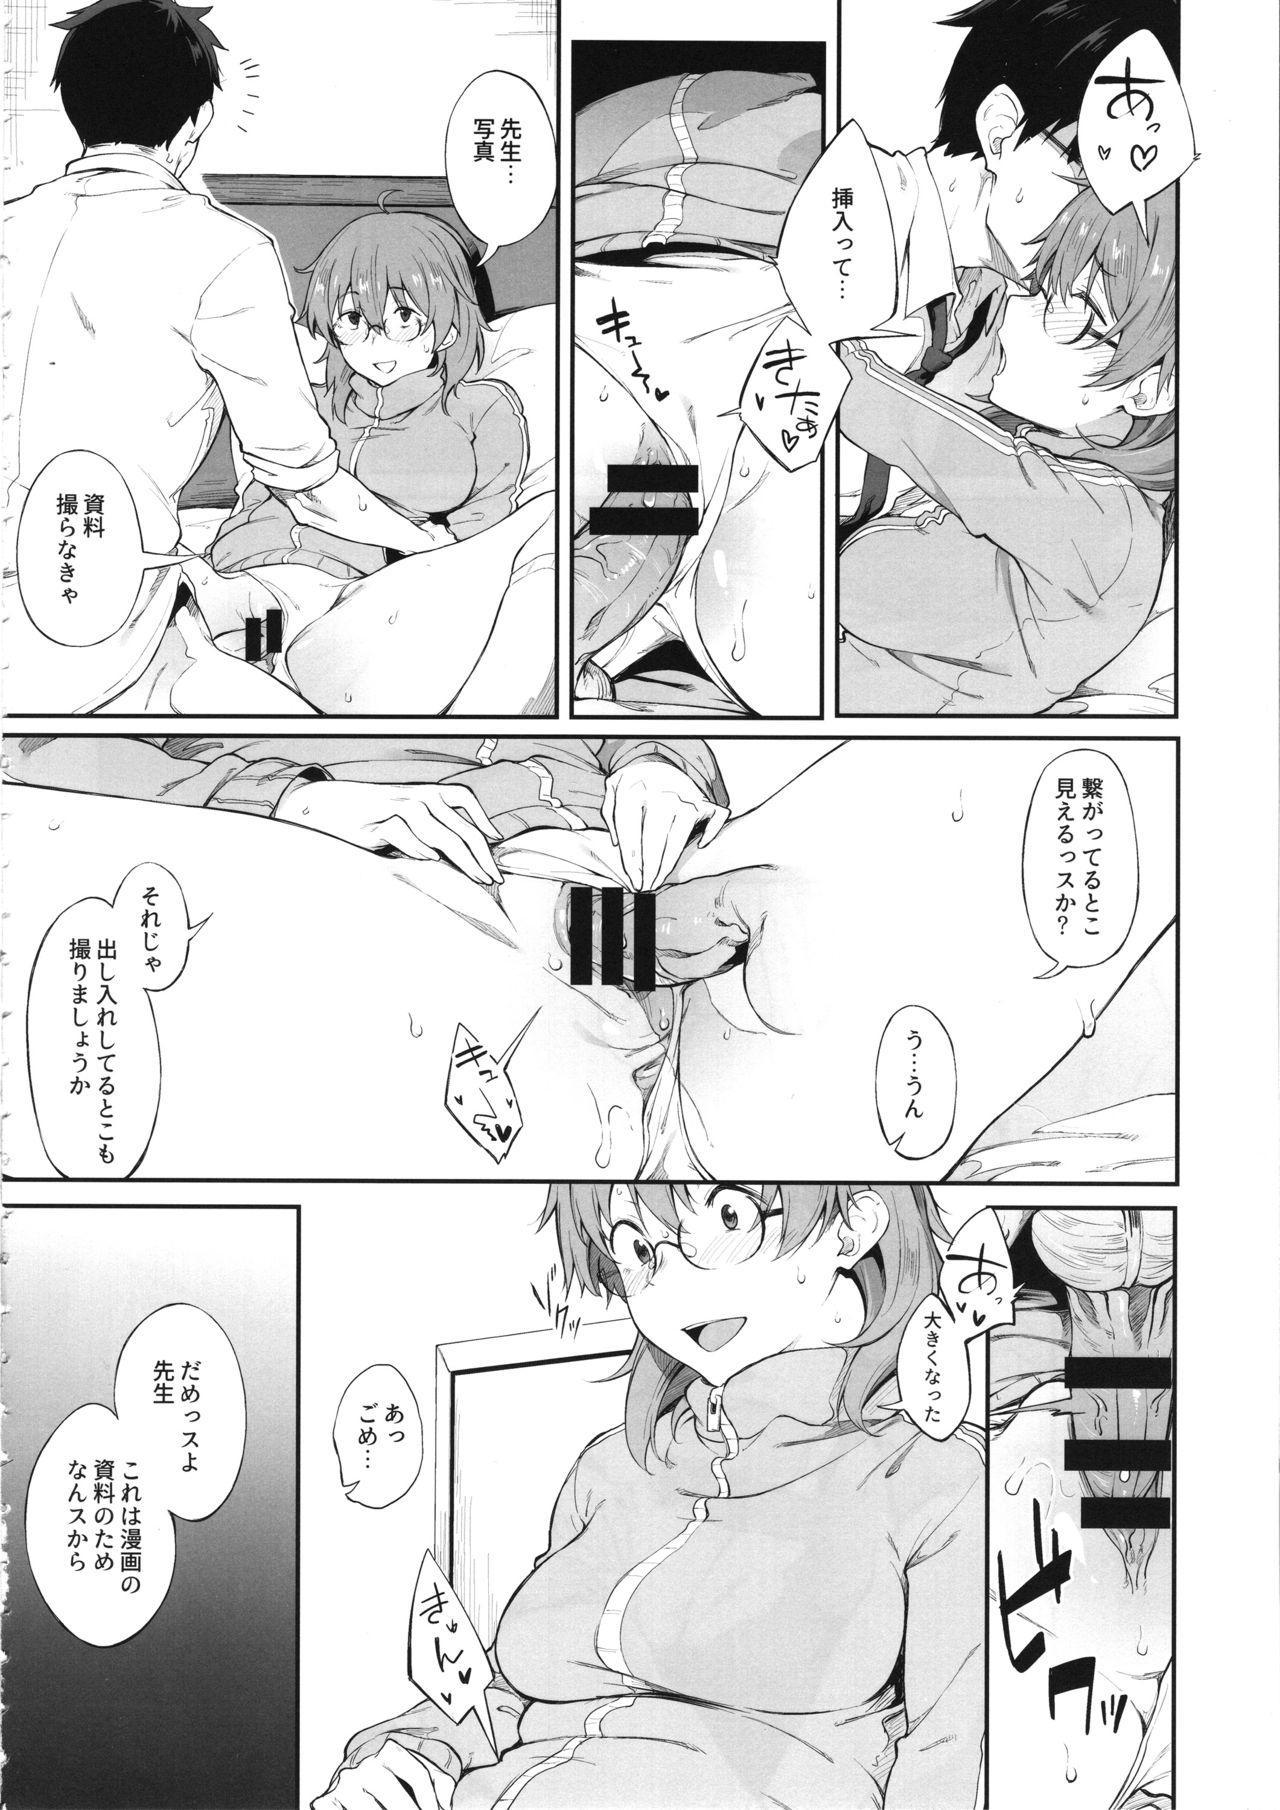 Sono Settei de Onegaishimasu 6